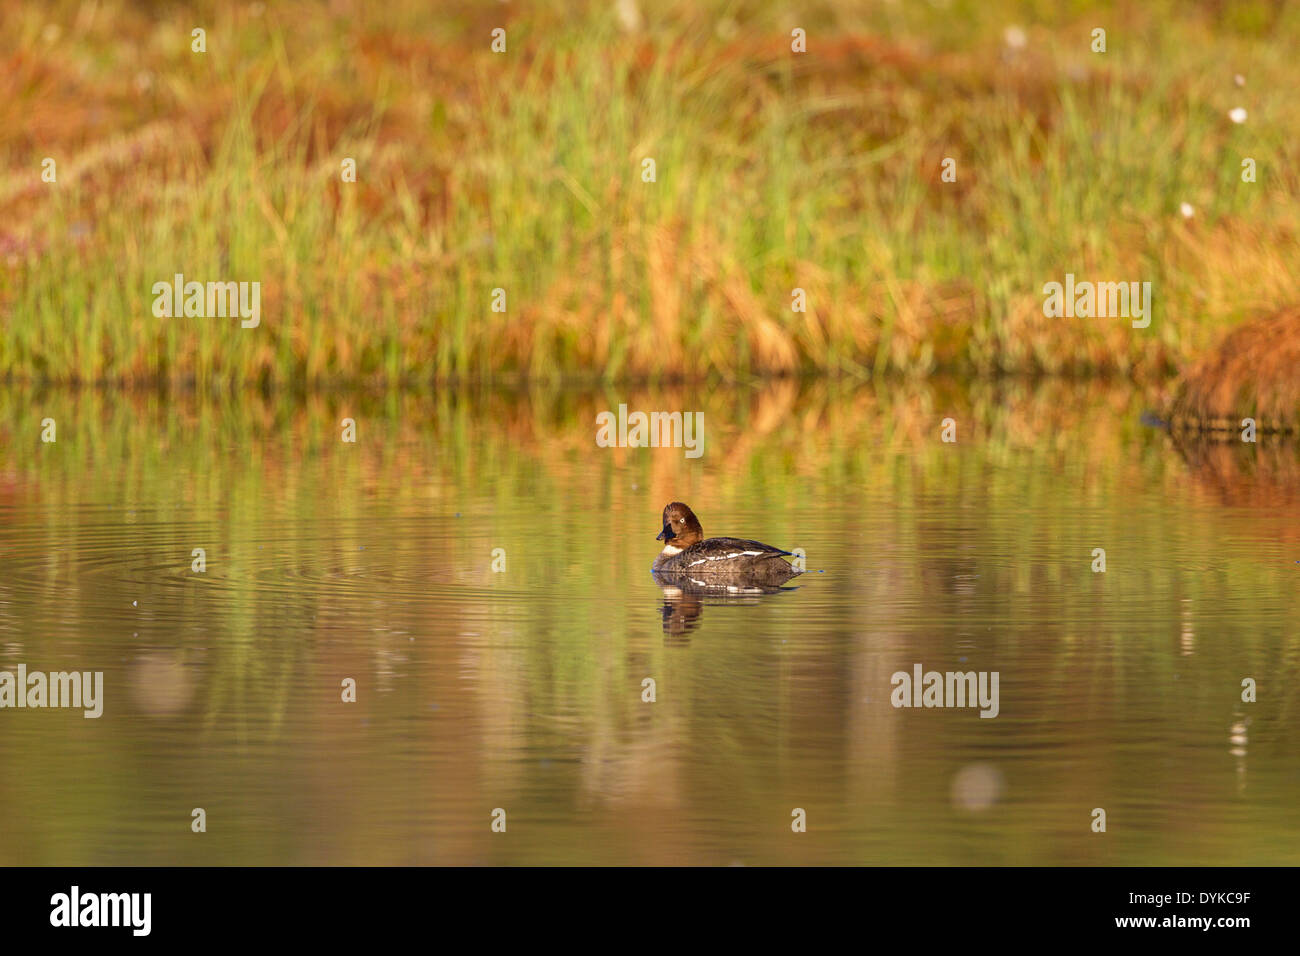 Goldeneye swimming in the lake - Stock Image